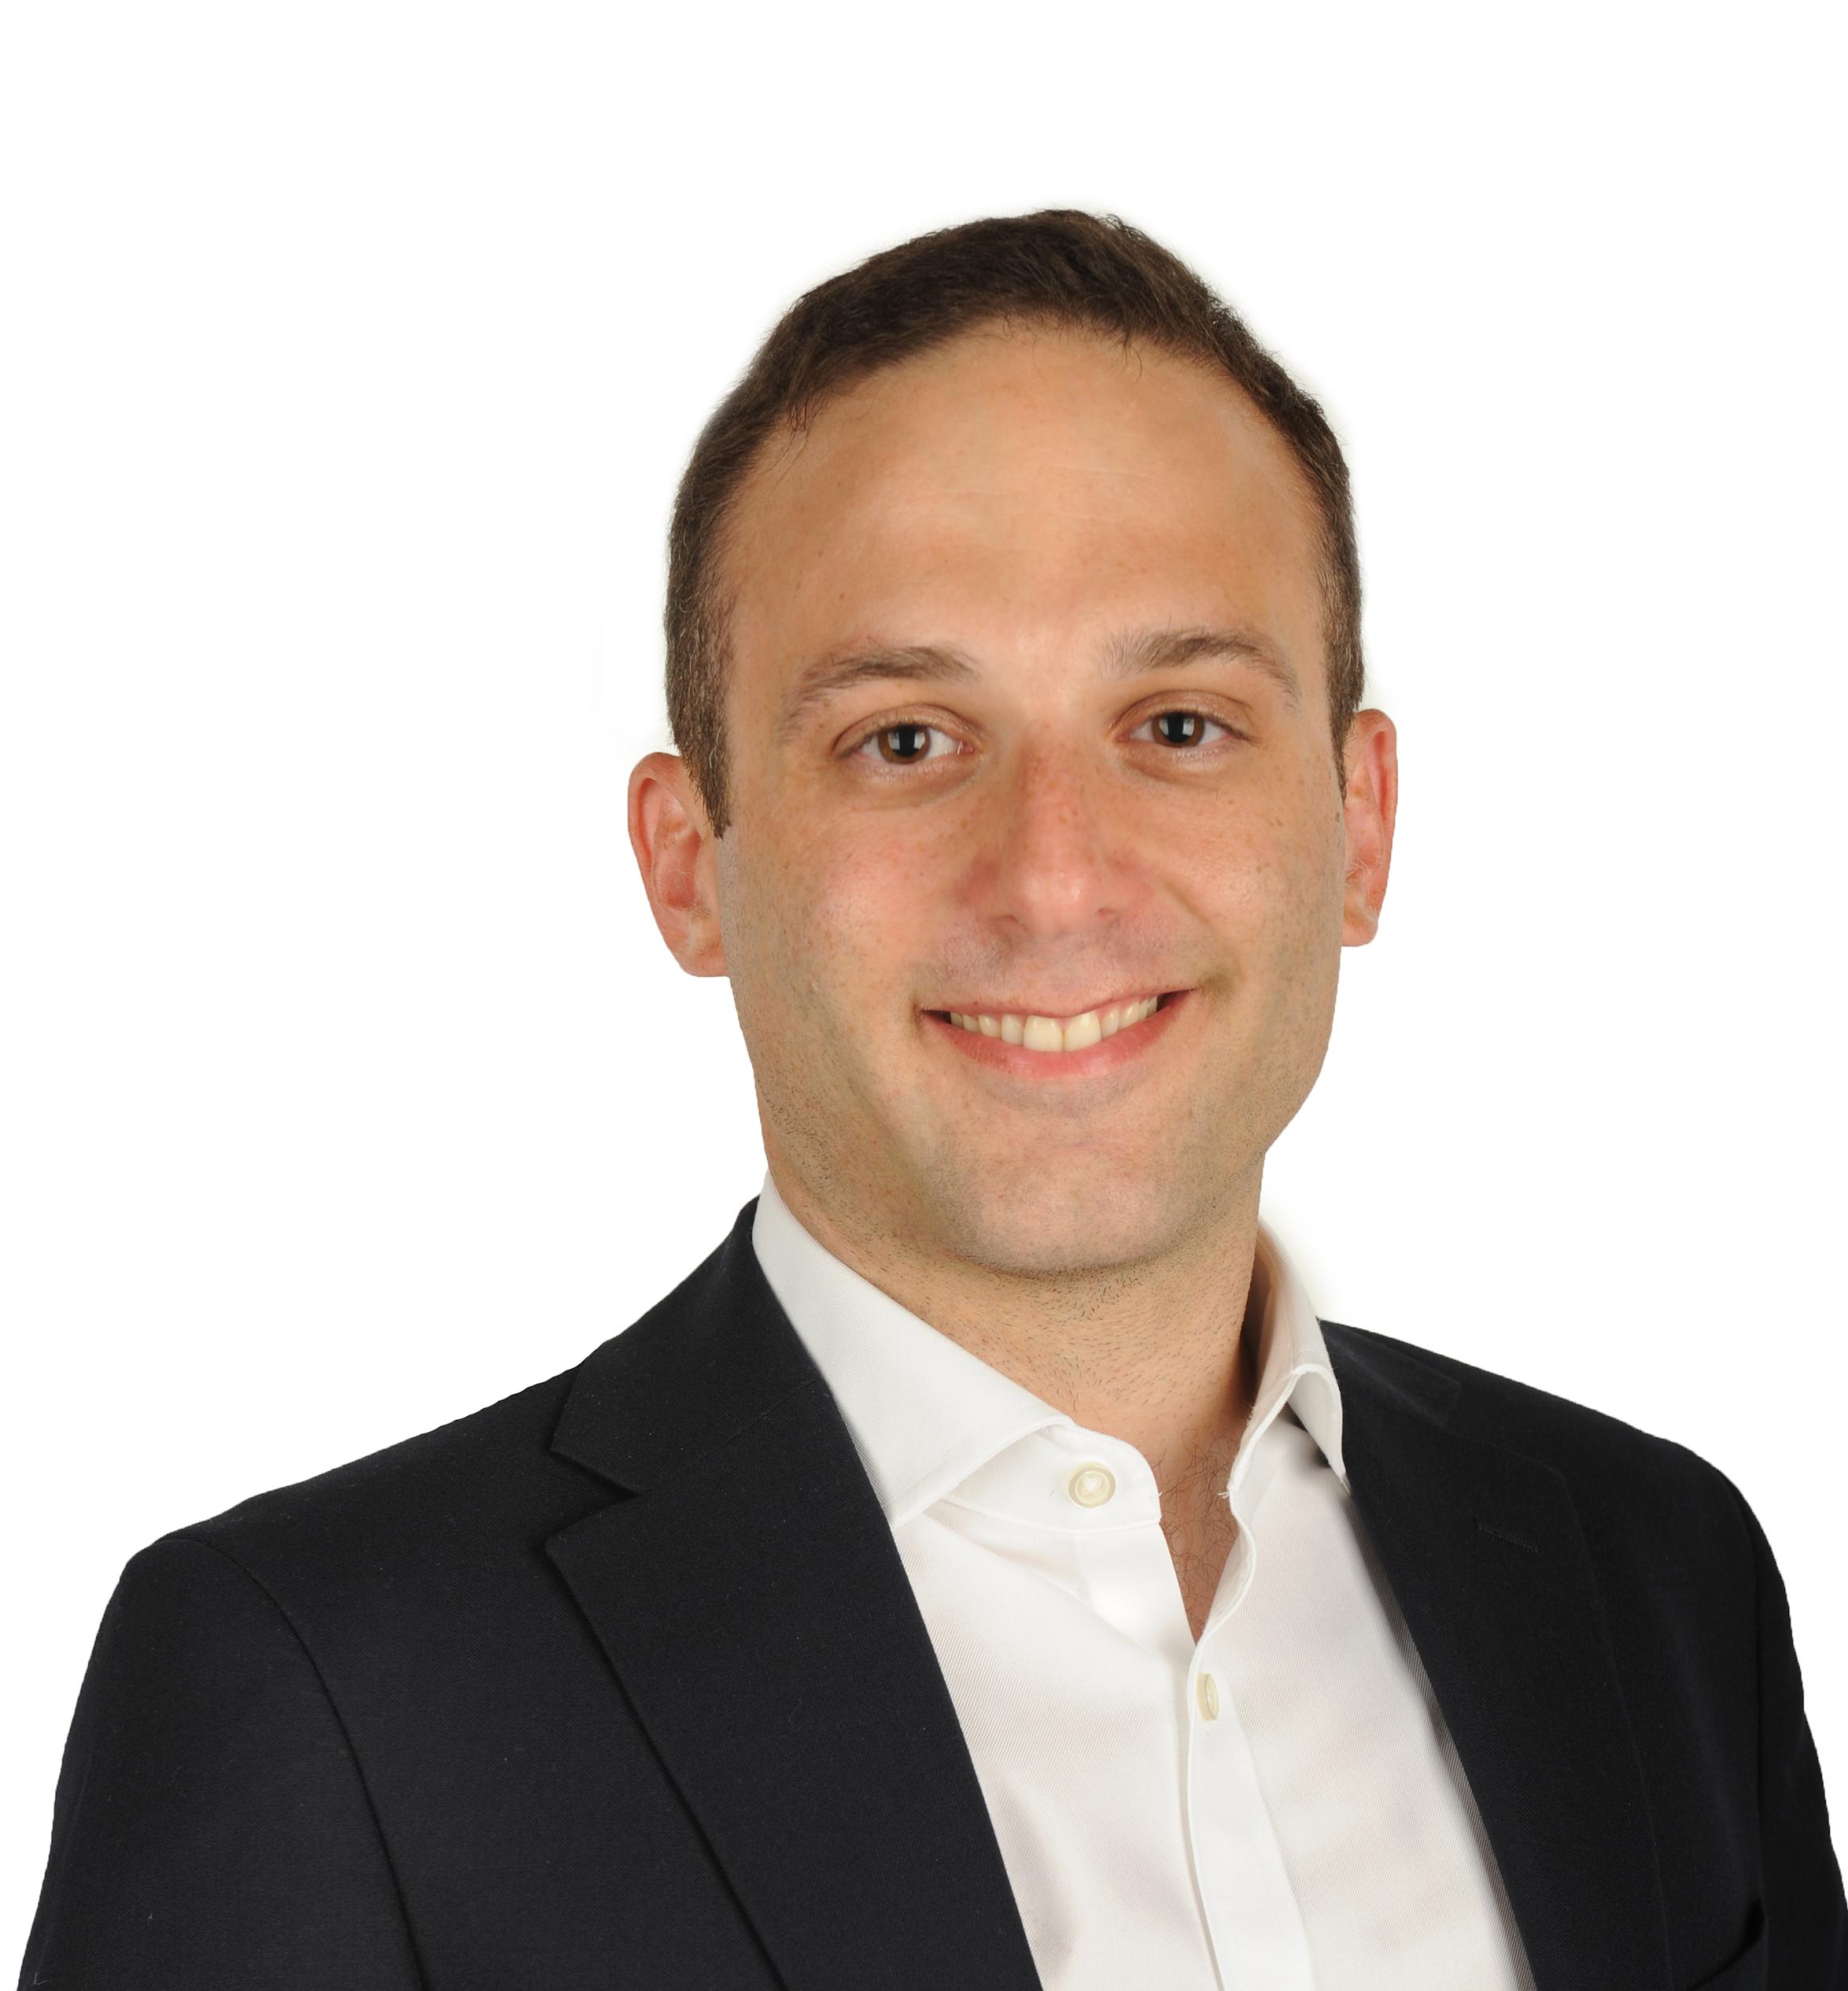 Nicholas Andreou, GCR President